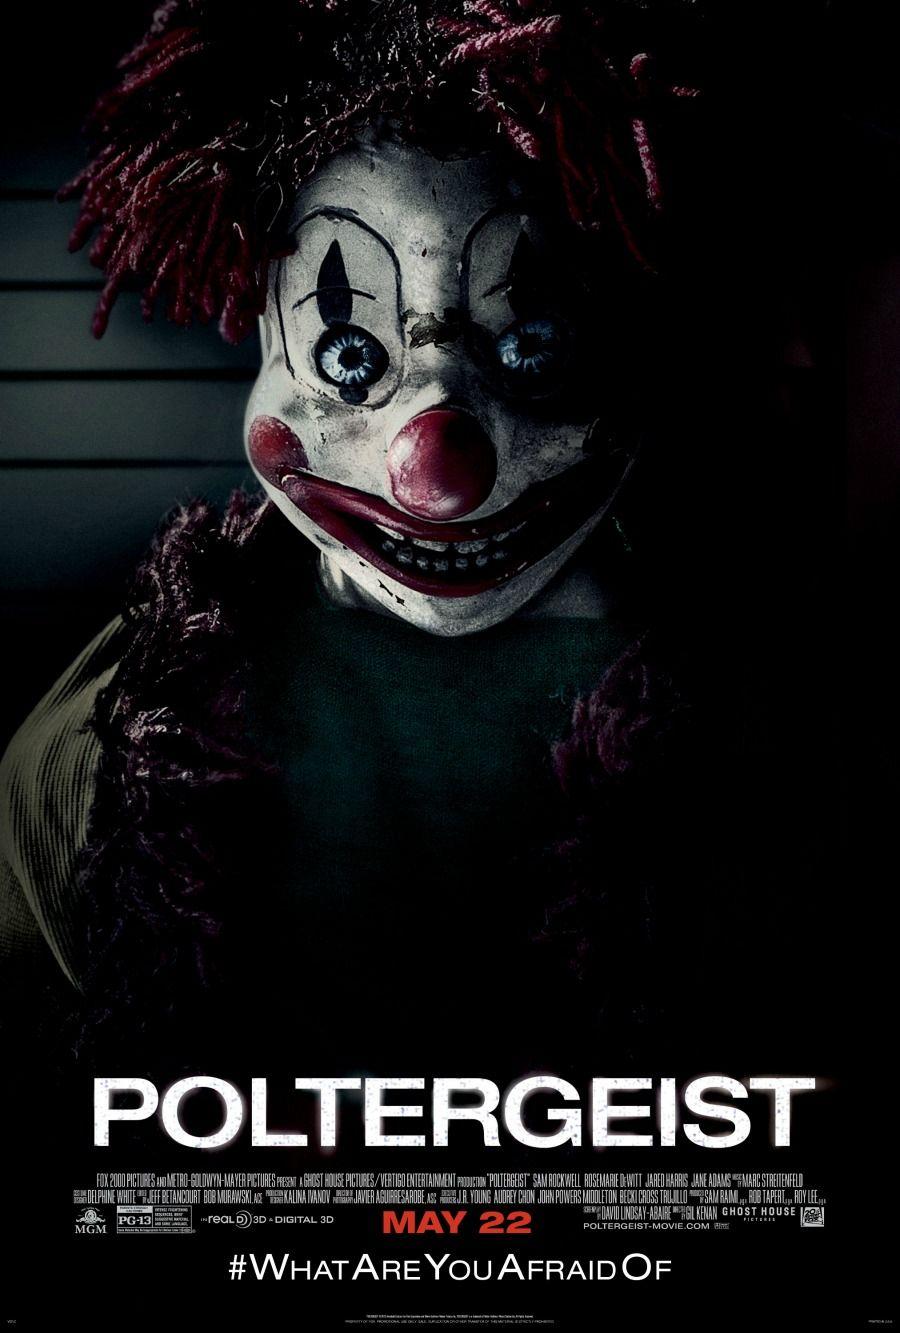 Poltergeist 2015 Horror Thriller Movie Directed By Gil Kenan